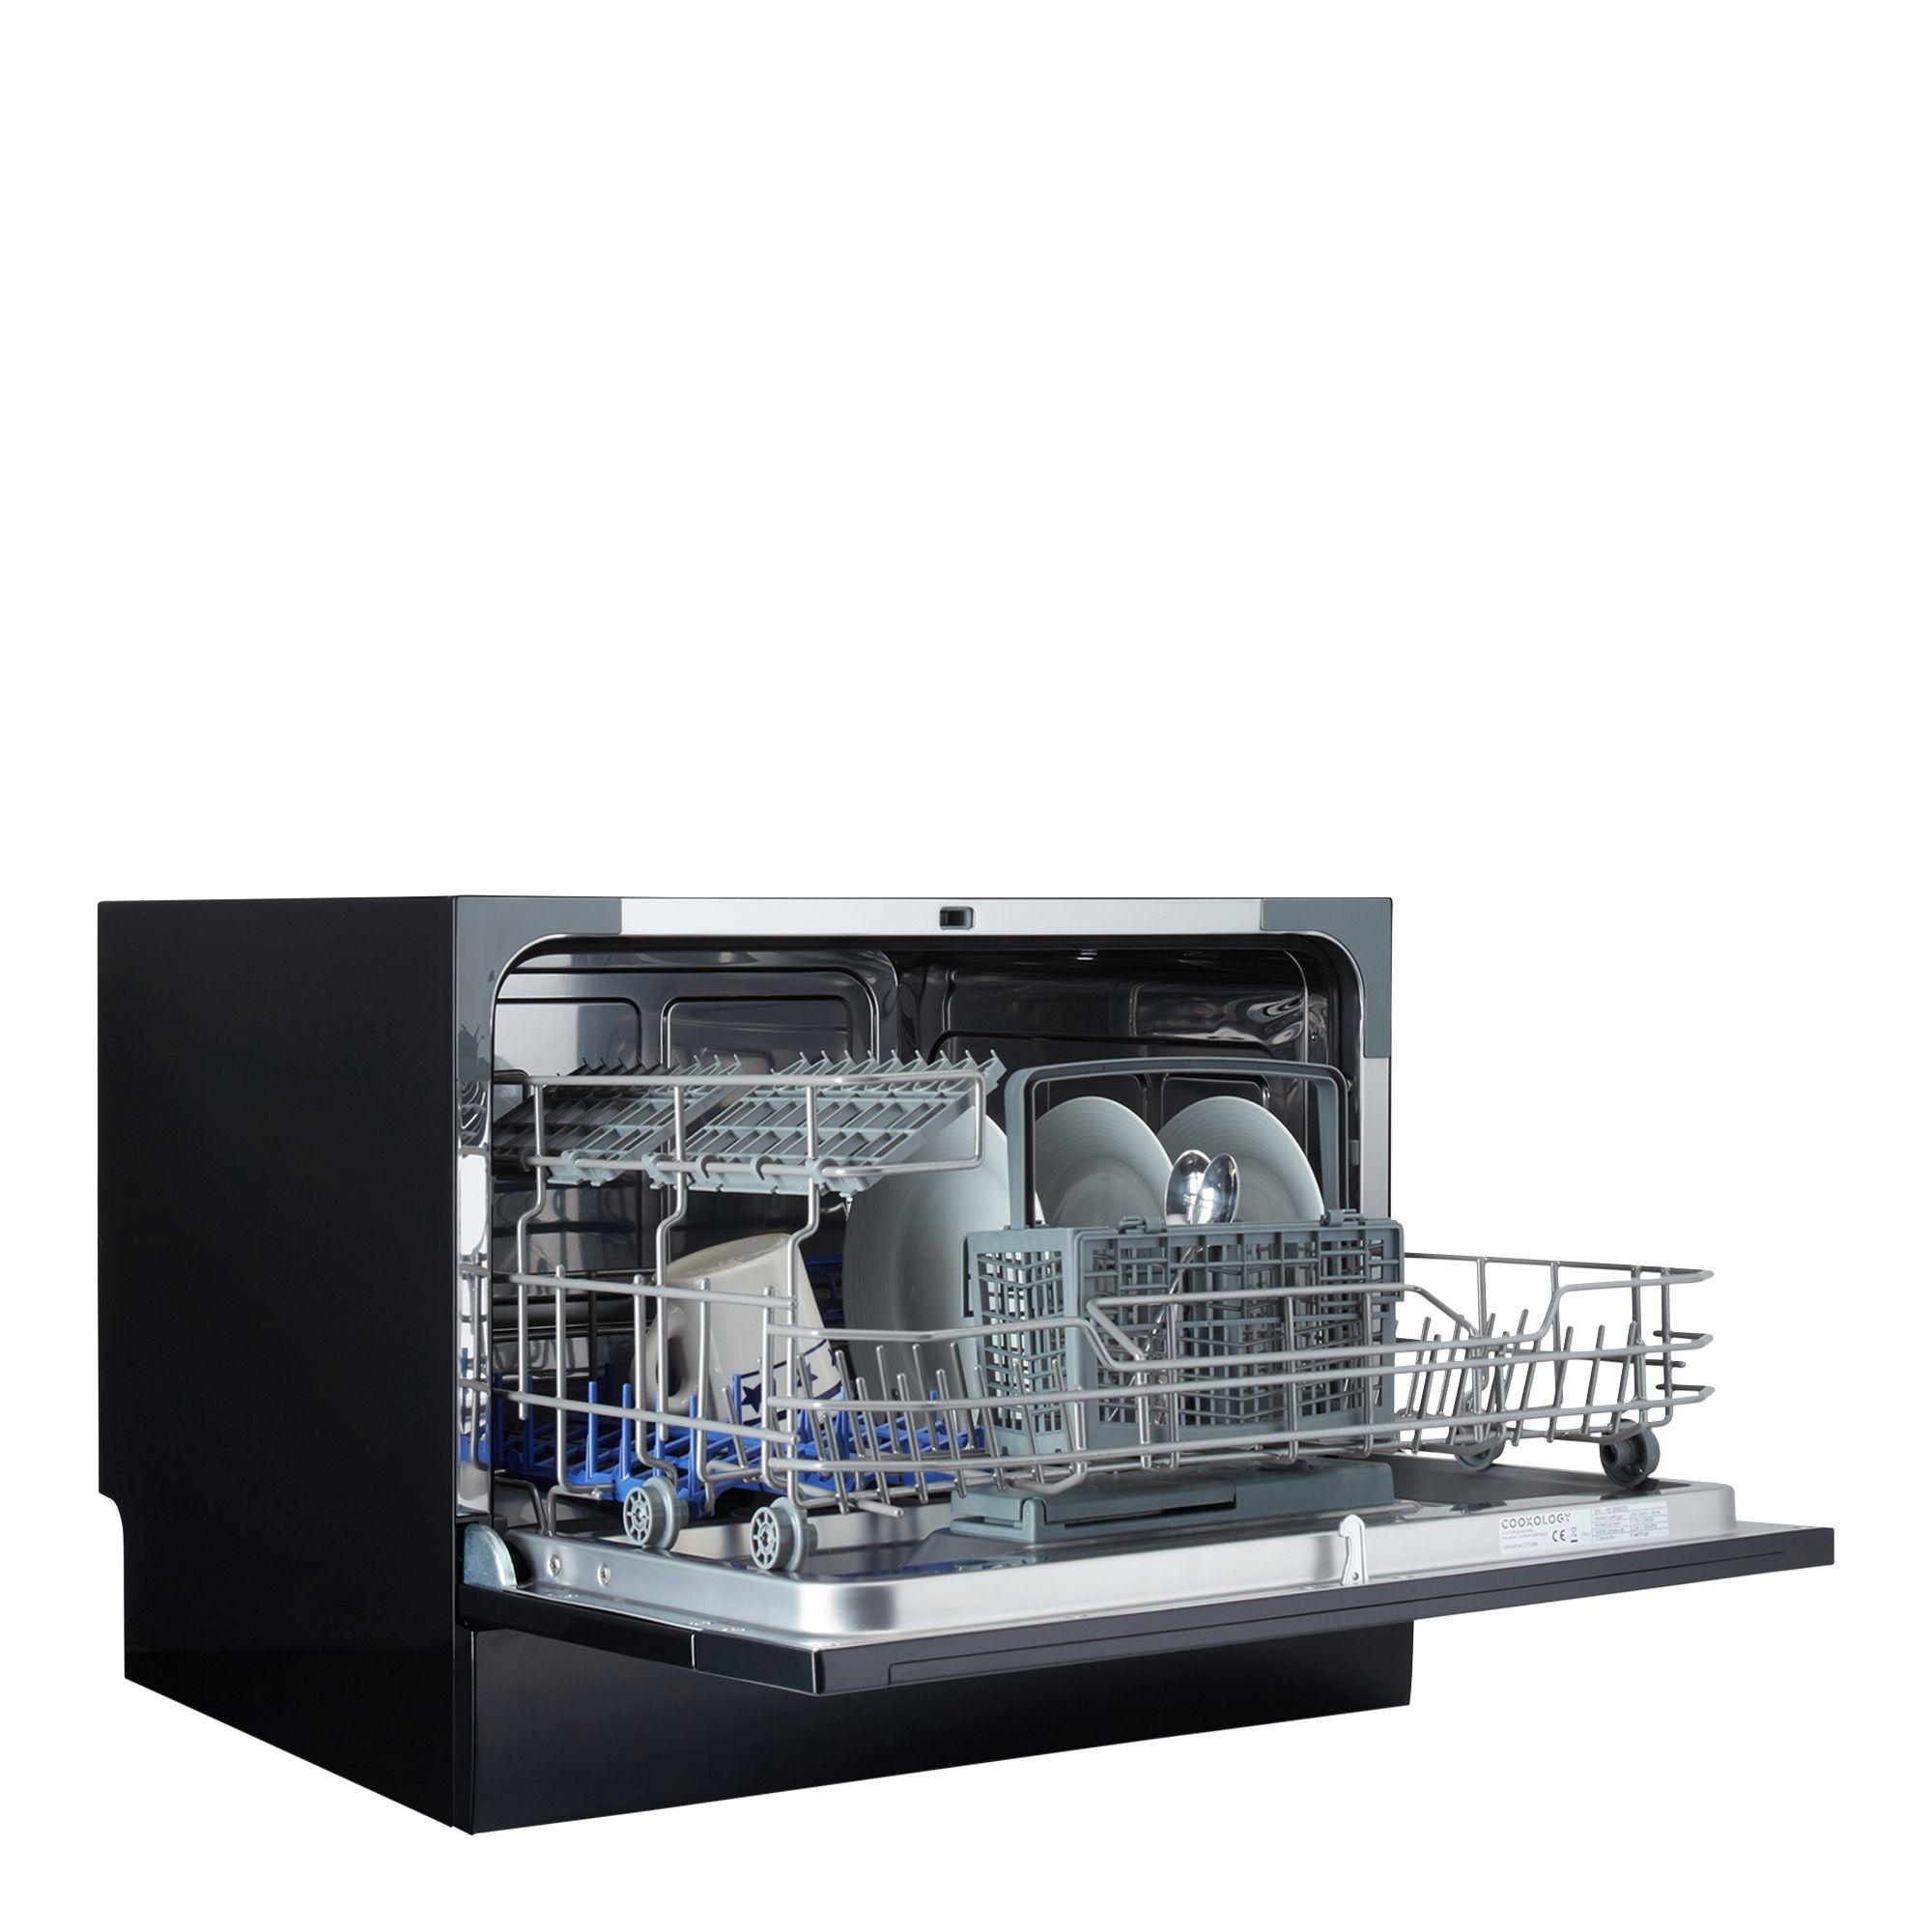 Cookology Black Table Top Mini Dishwasher Dishwasher Sizes